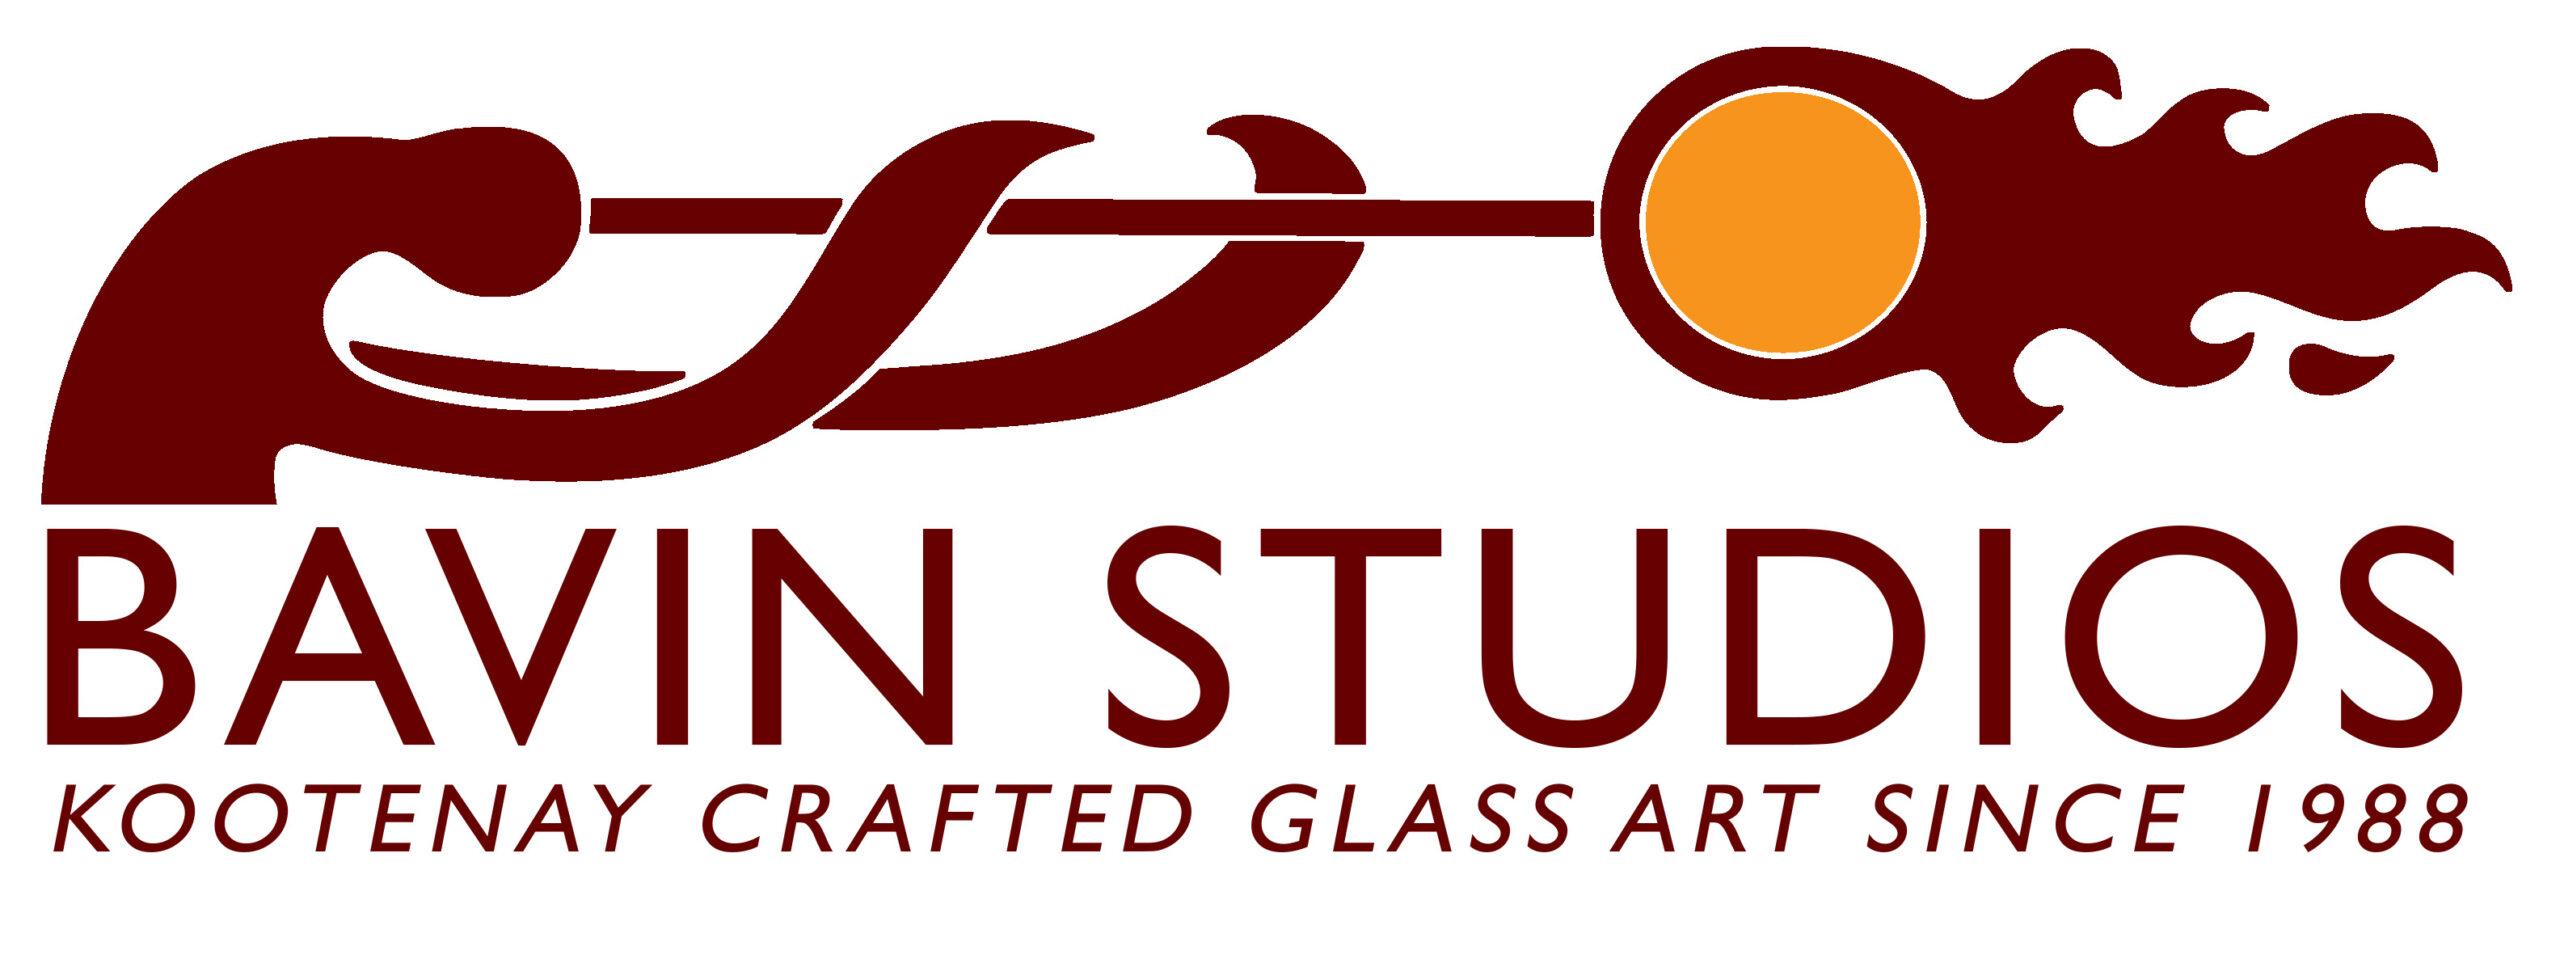 Bavin Studios logo